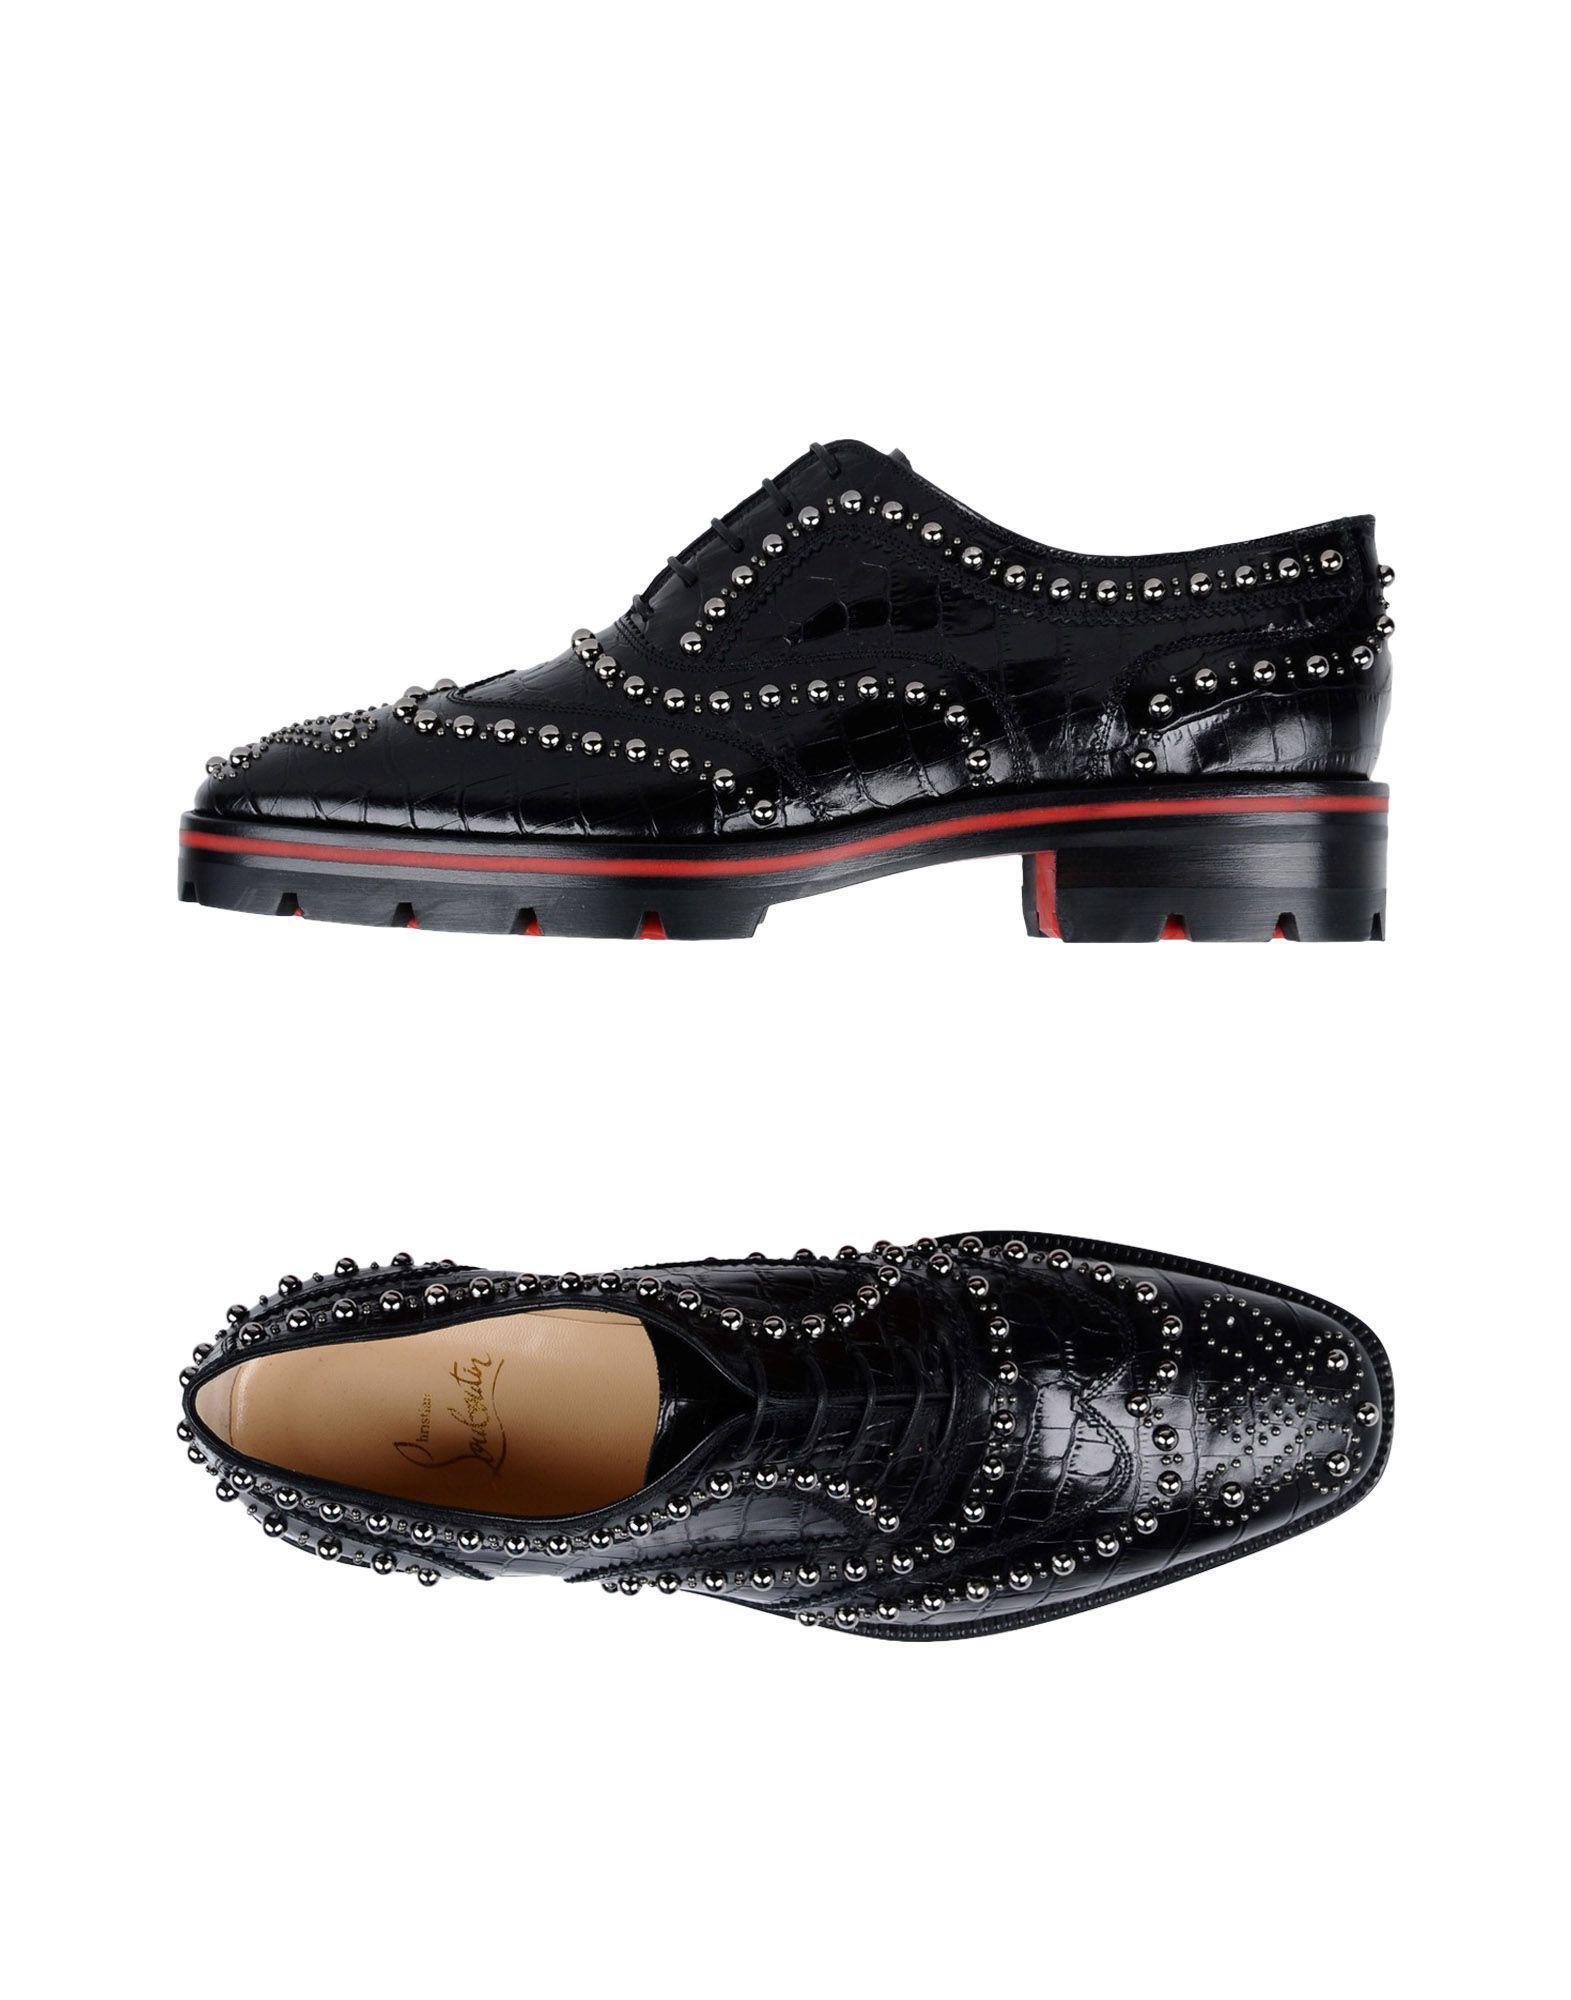 daecc448b29 Lace-Up Shoes in Black